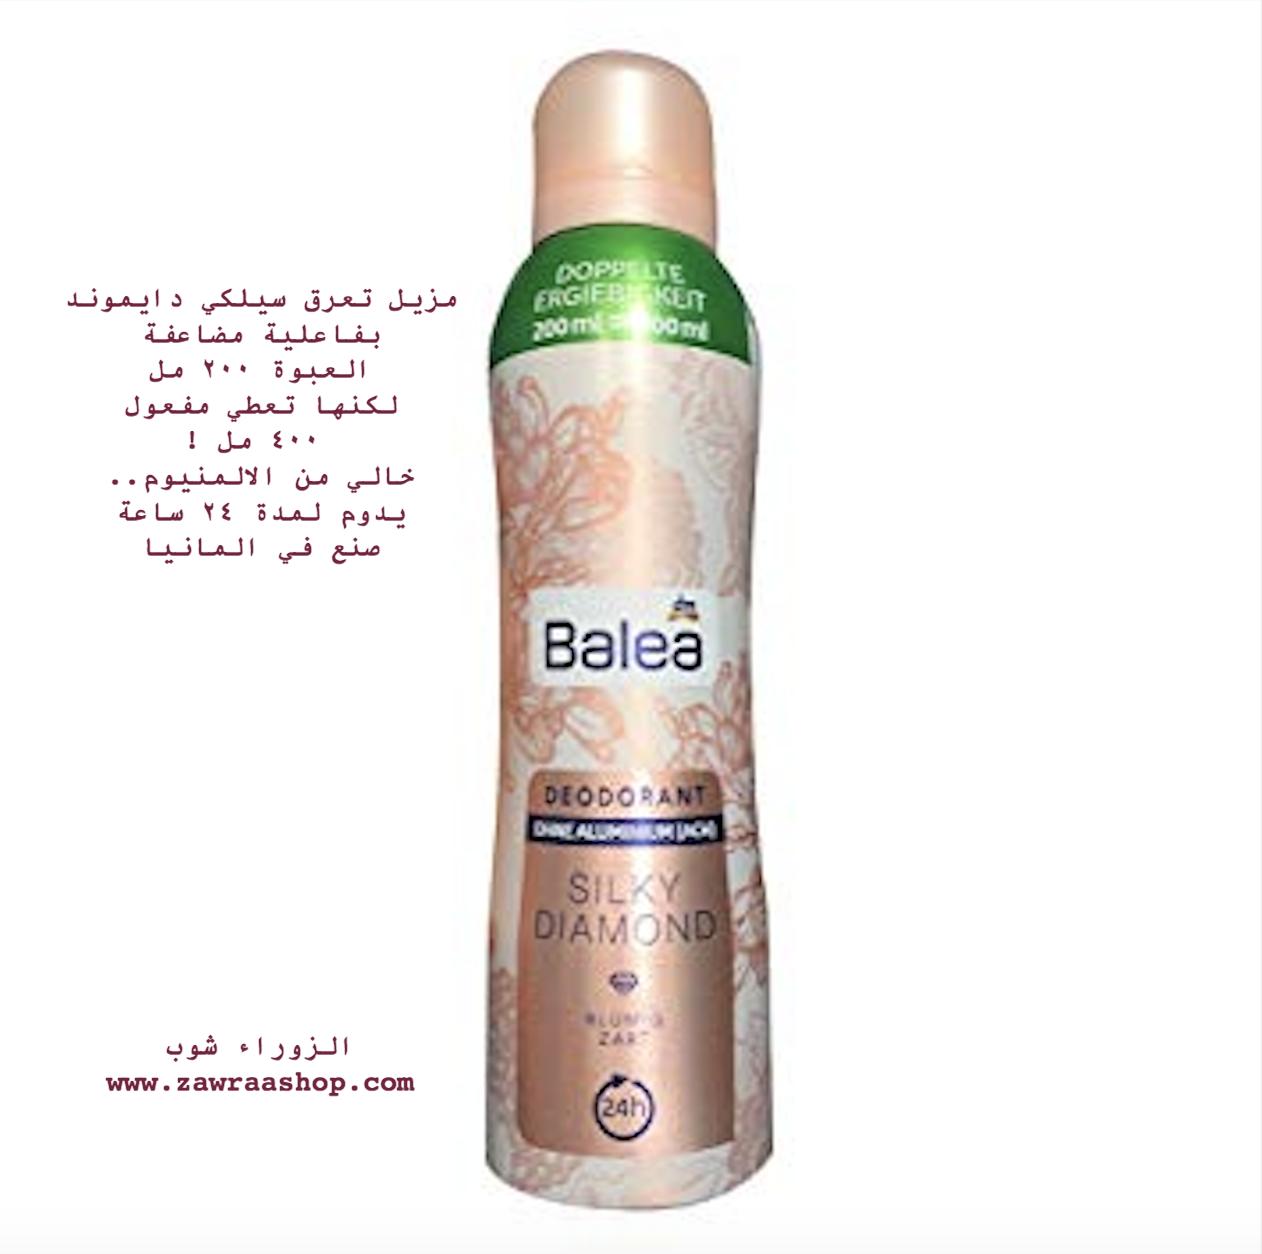 B103 Silky Diamond Deodorant 24H without AL 200ml معطر سلكي دايموند